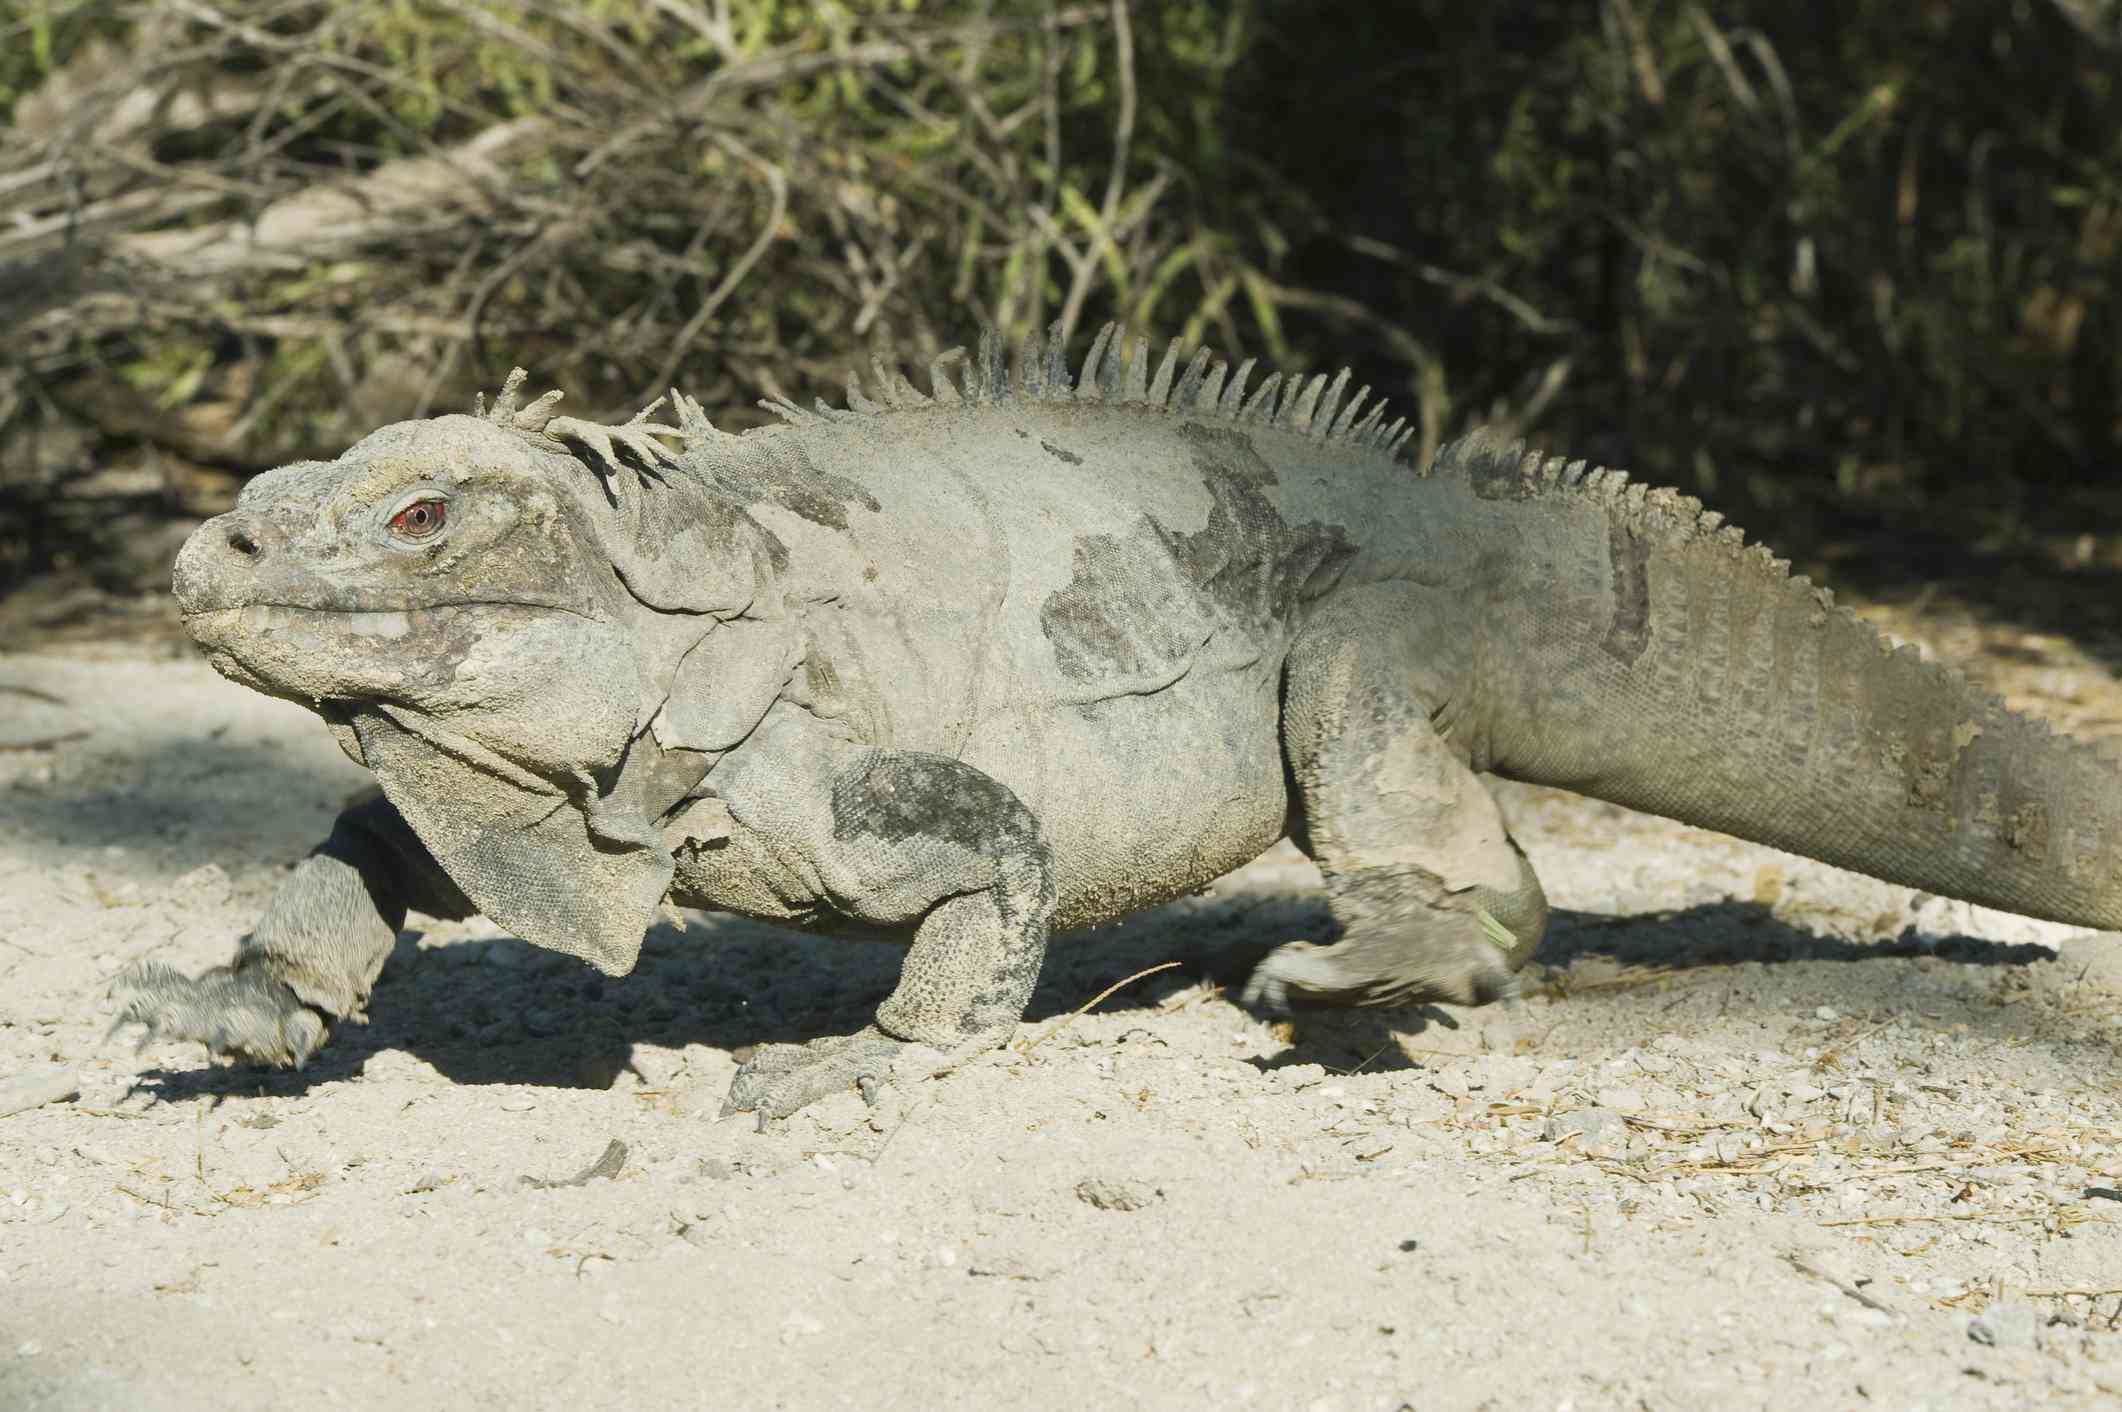 Ricord's Rock Iguana